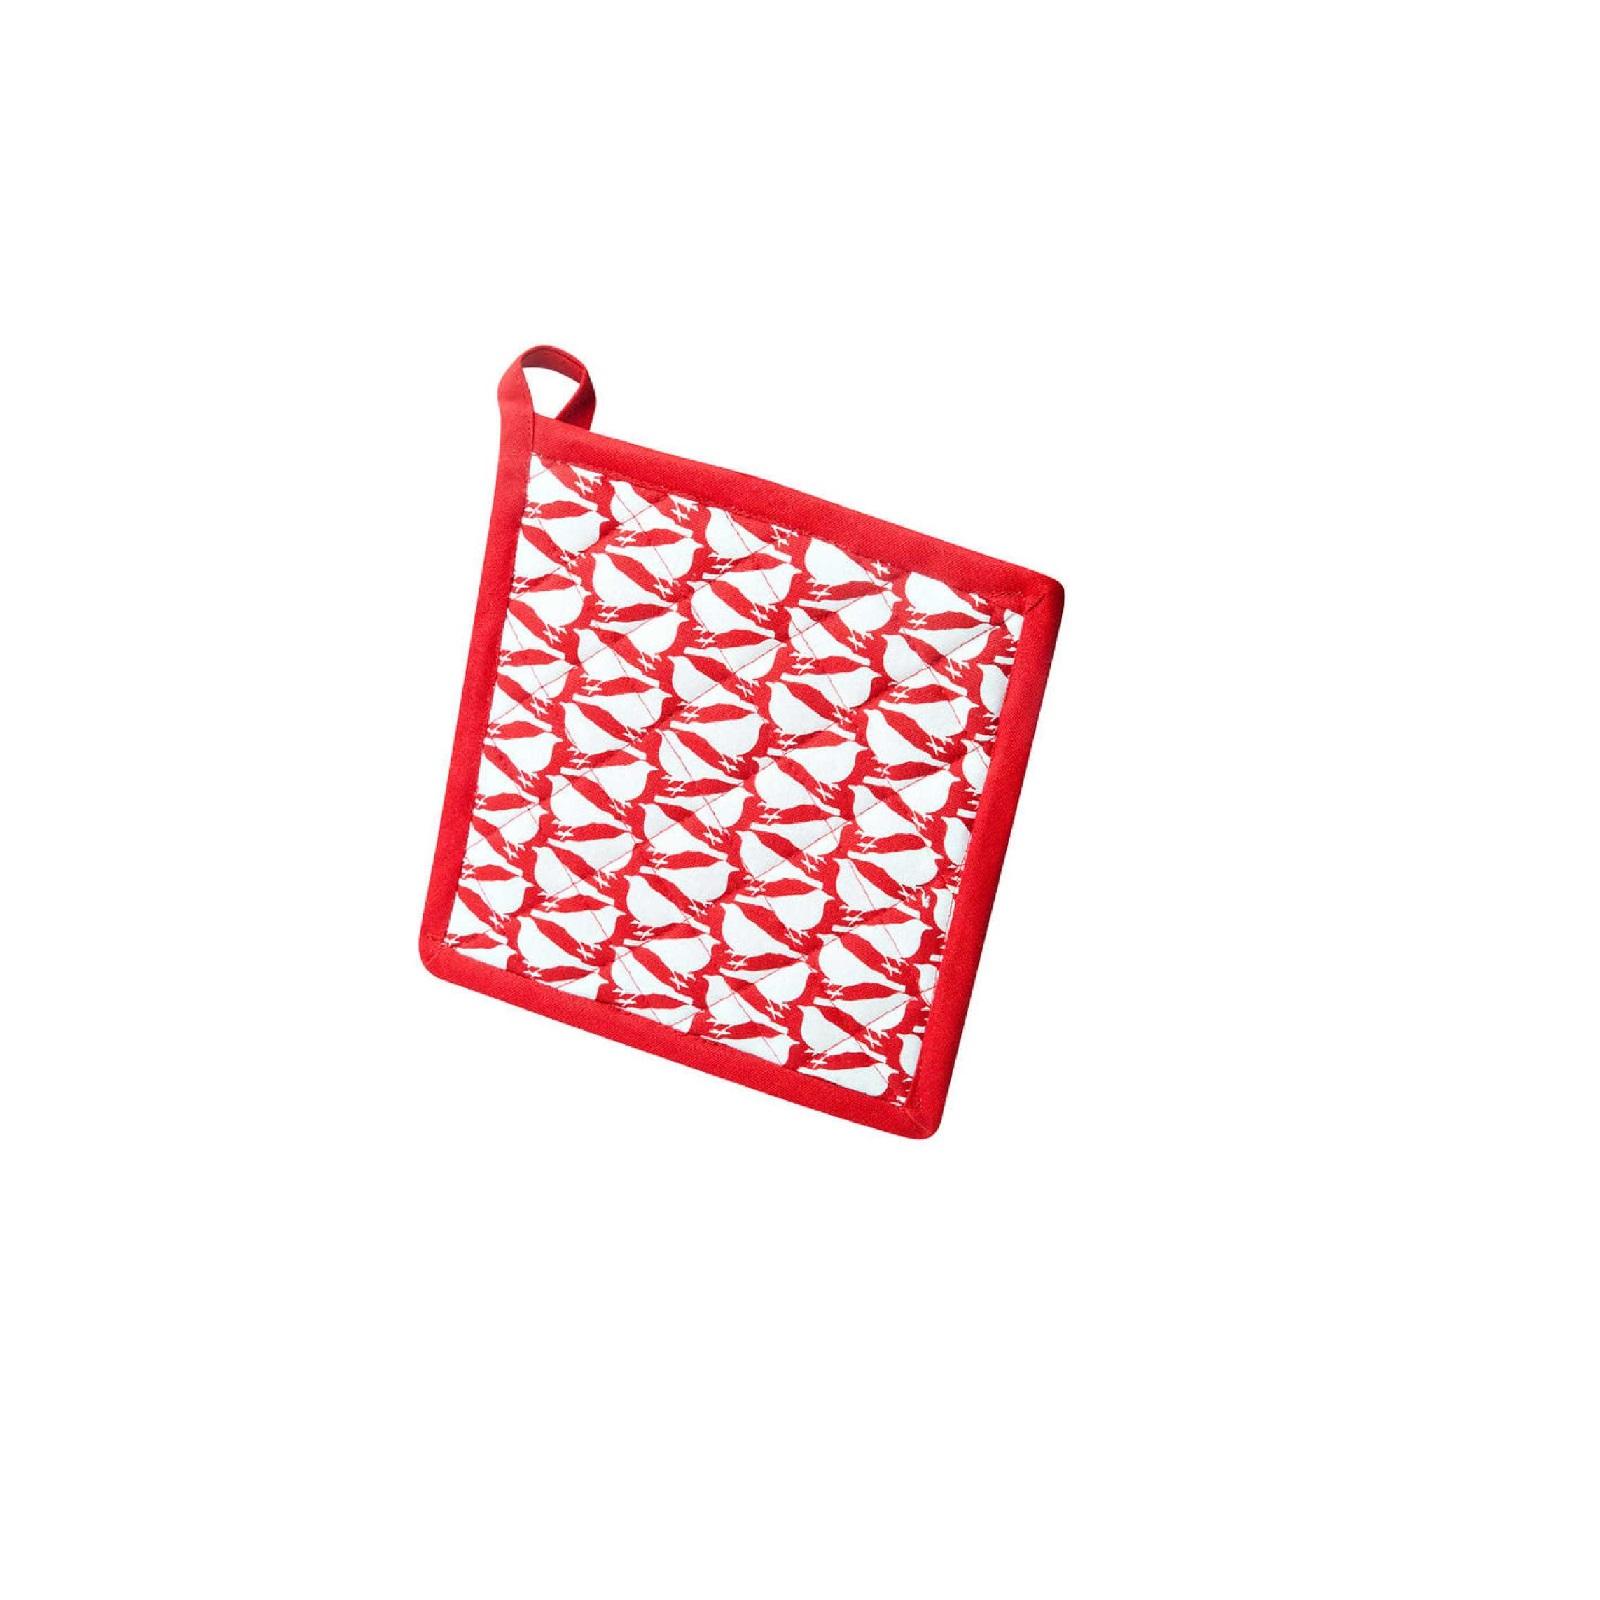 Прихватка кухонная Winkler FANTASY RED, 20х20 см, красный Winkler 2719730000 фото 1